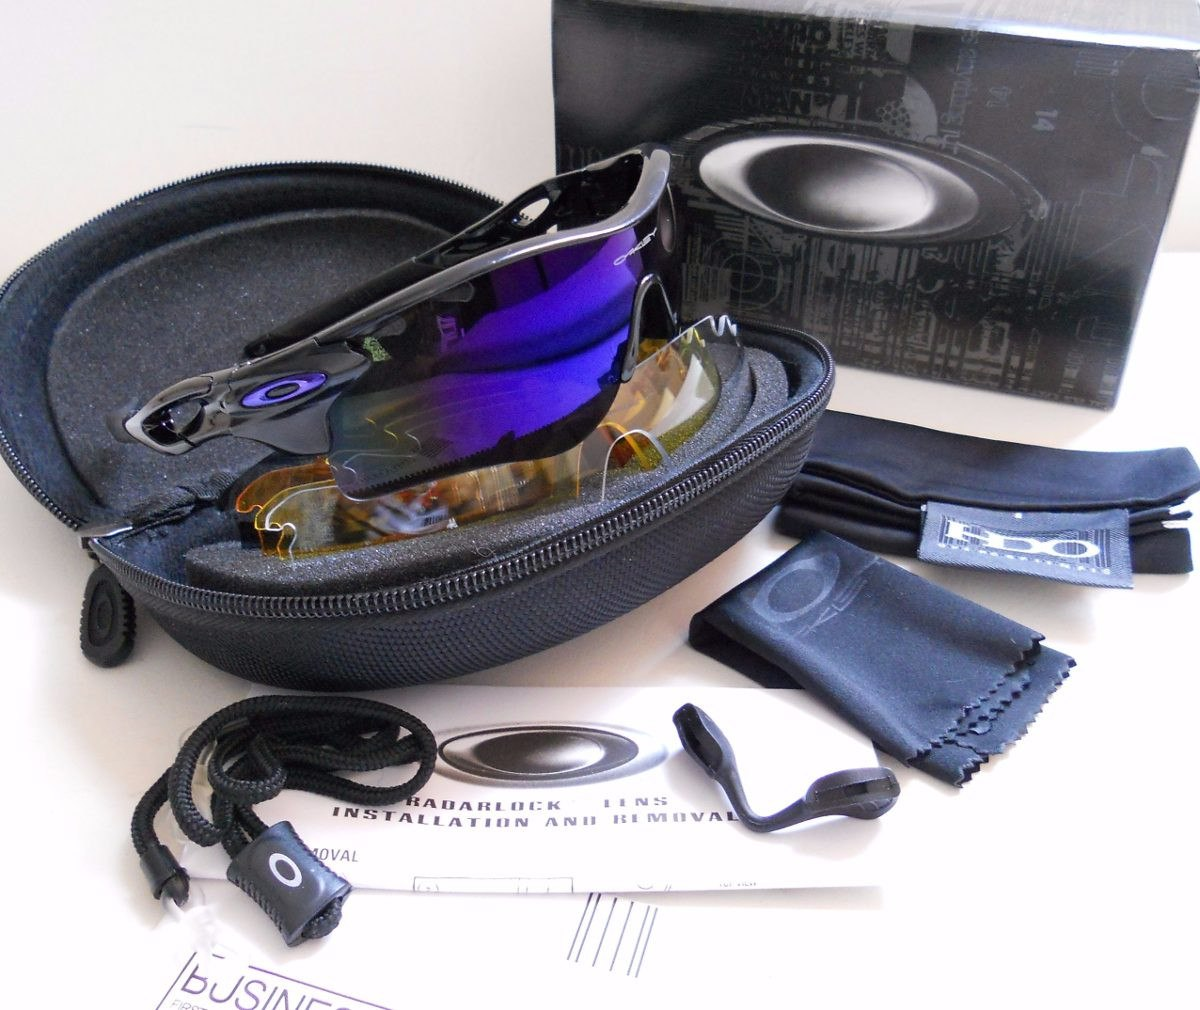 2847b85953a5f Gafas Oakley Radar Sport Sunglasses Marco 4 Lentes - U S 155,00 en ...